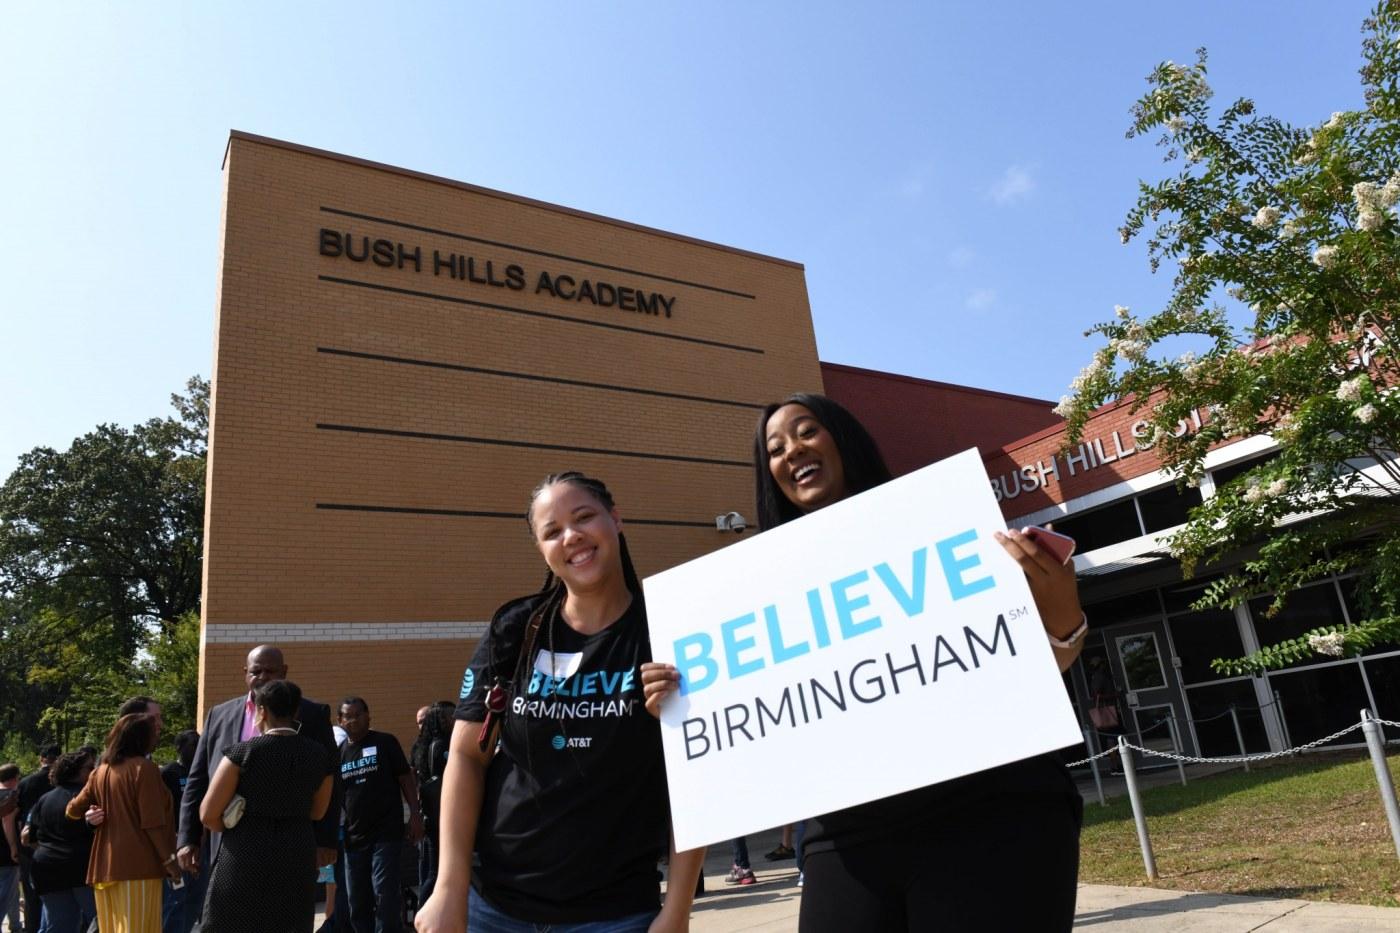 I believe in Birmingham